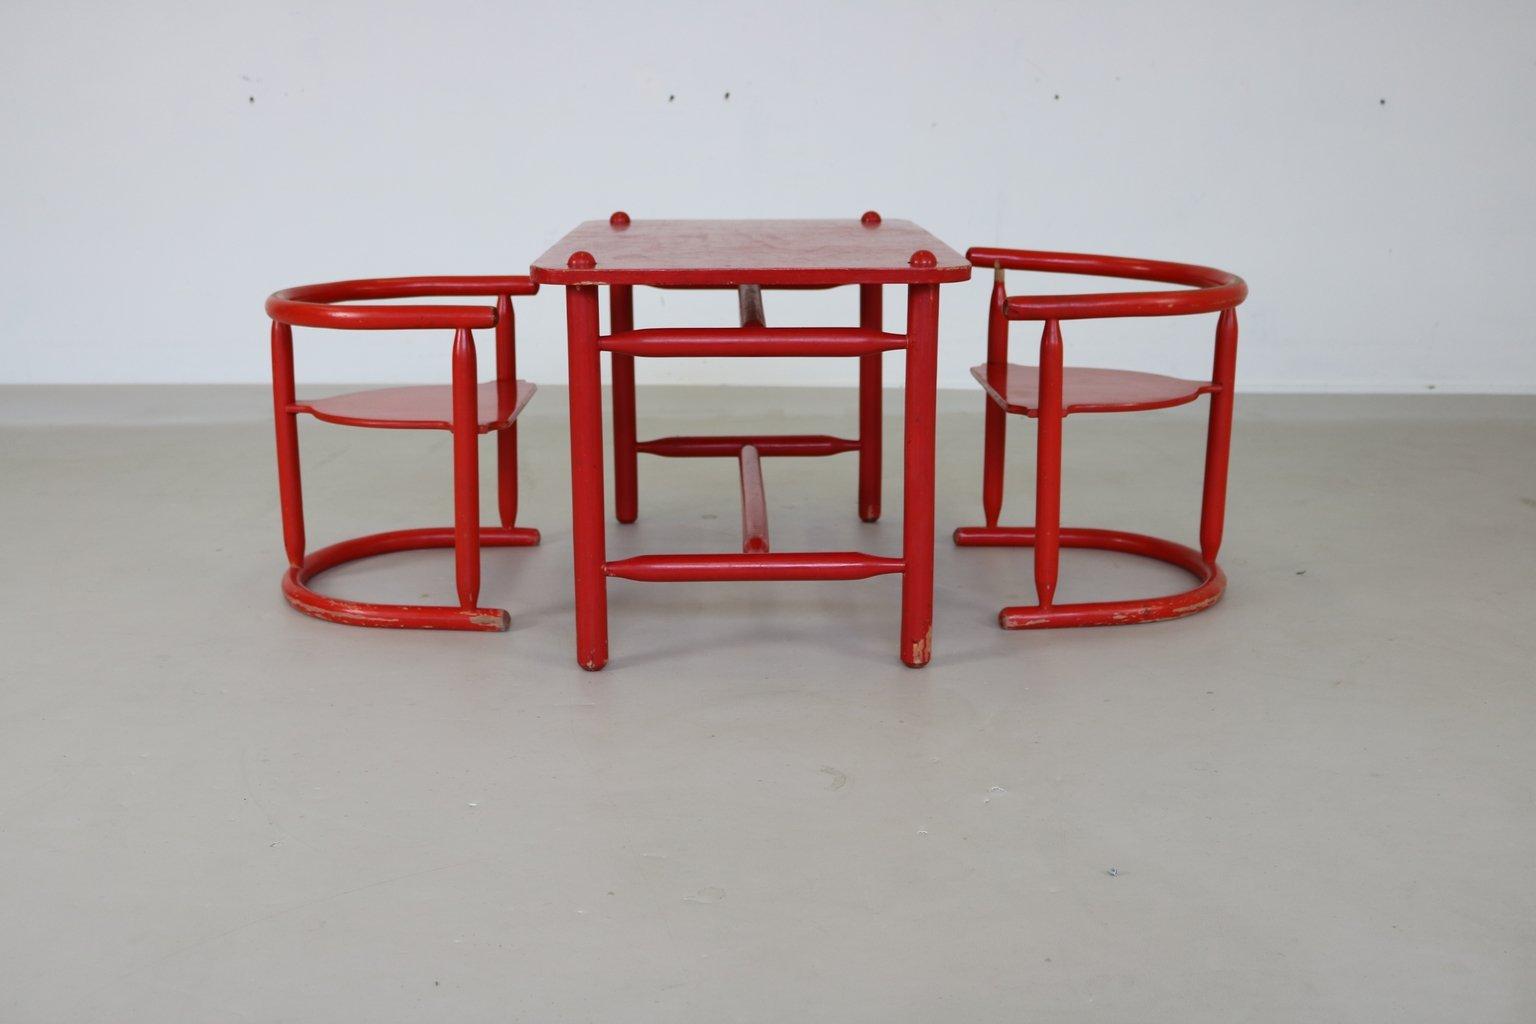 dreiteilige anna kindersitzgruppe von karin mobring f r. Black Bedroom Furniture Sets. Home Design Ideas